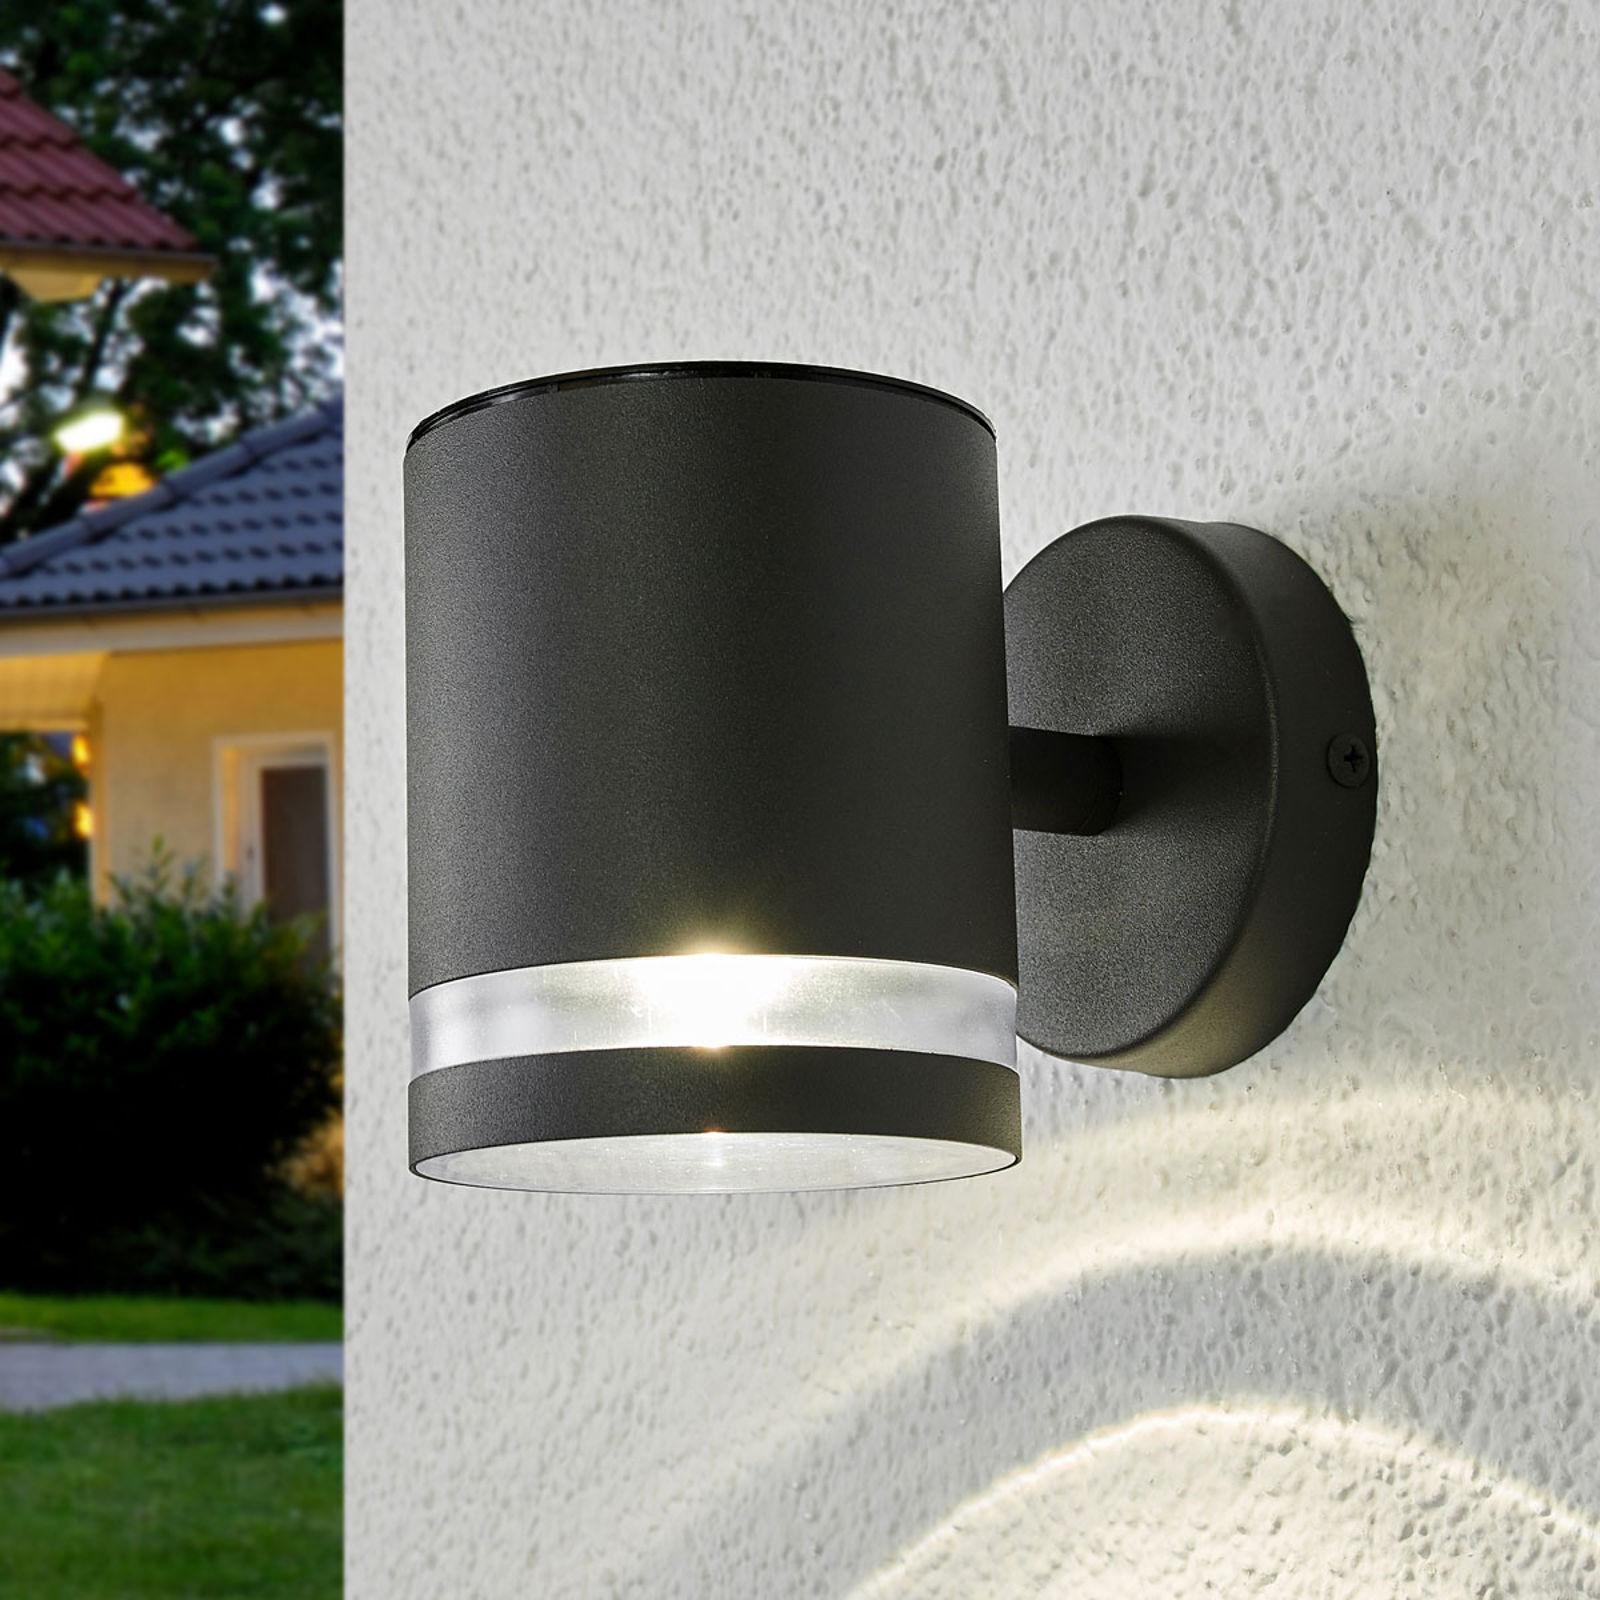 Szary solarny kinkiet zewnętrzny LED Melinda